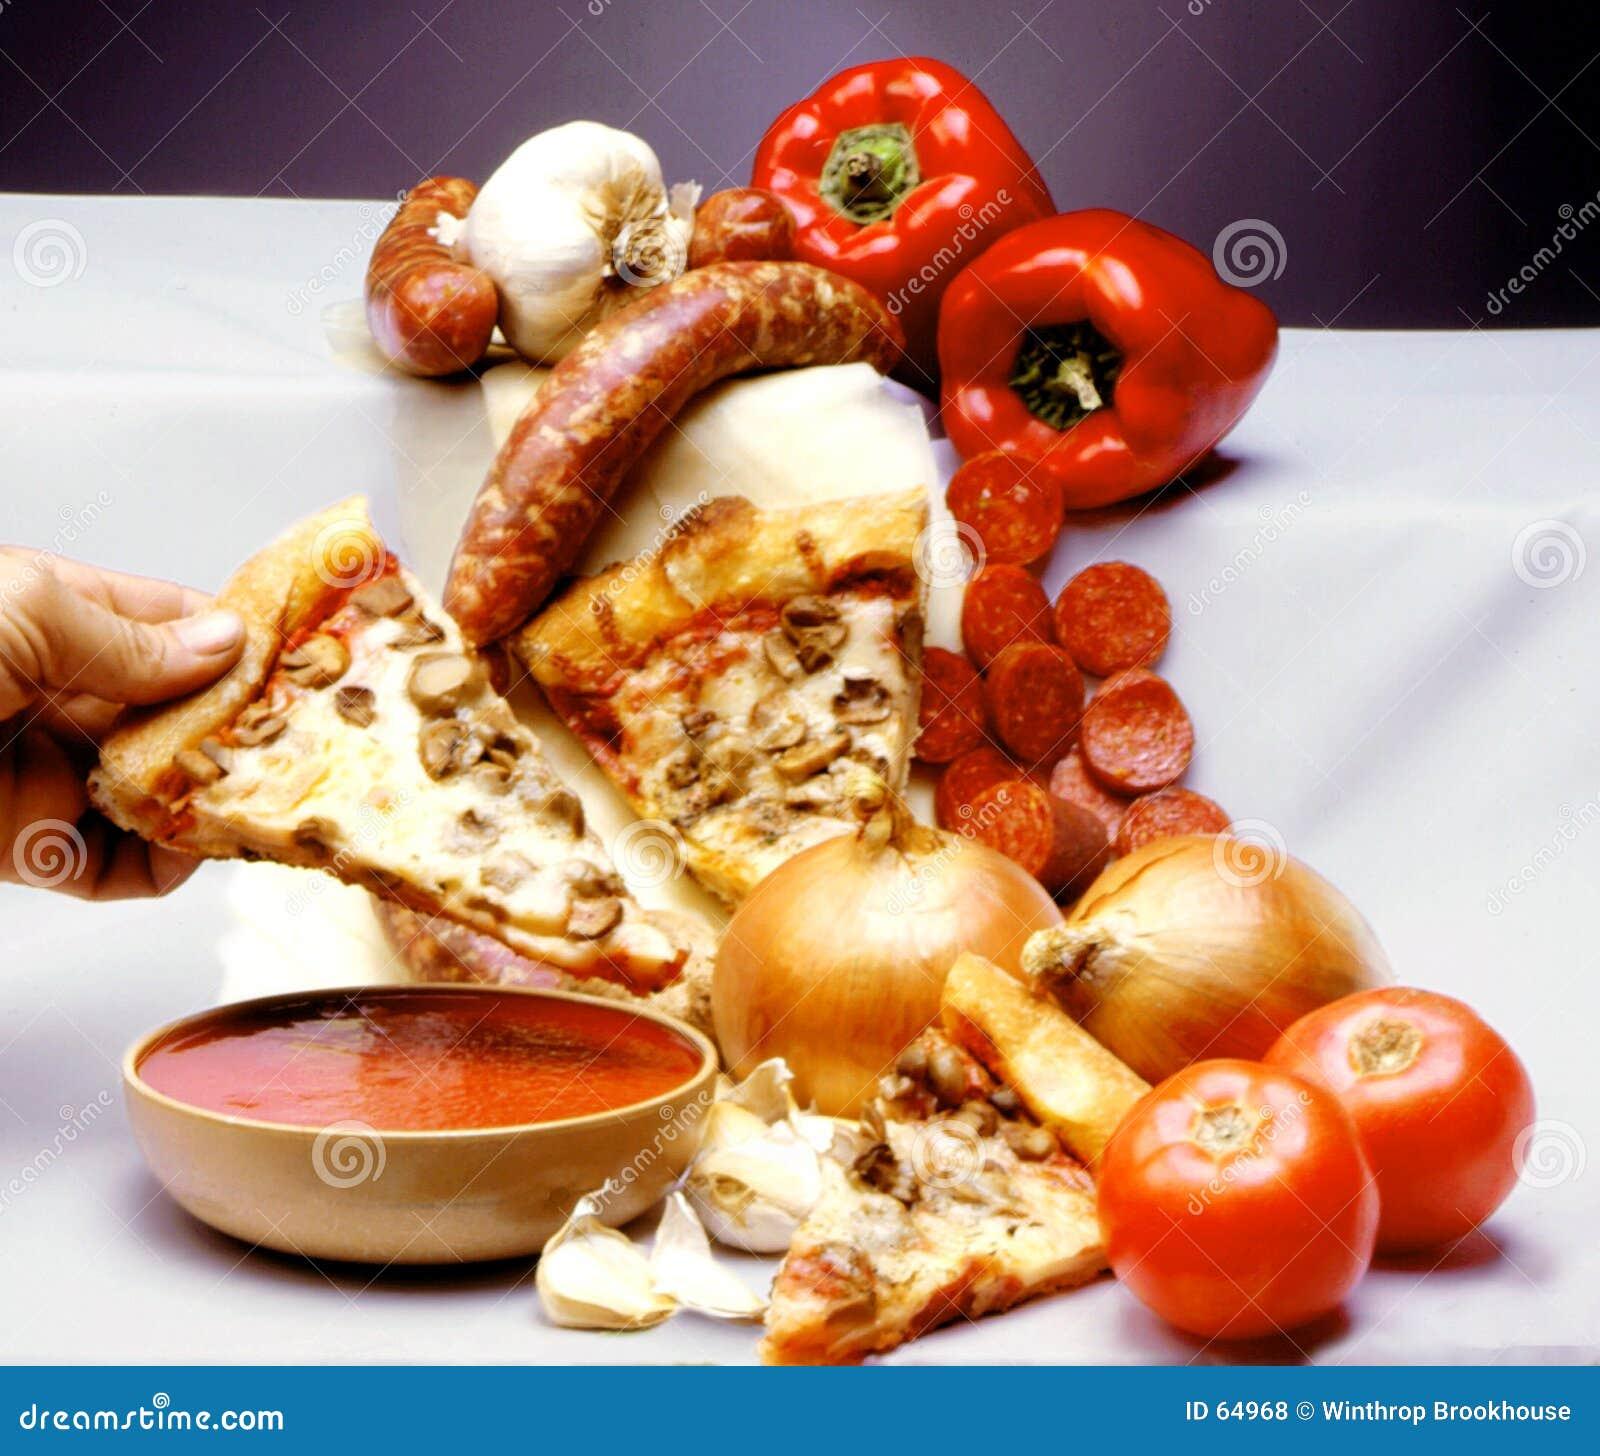 Download πίτσα στοκ εικόνες. εικόνα από ιταλικά, γρήγορα, συστατικά - 64968